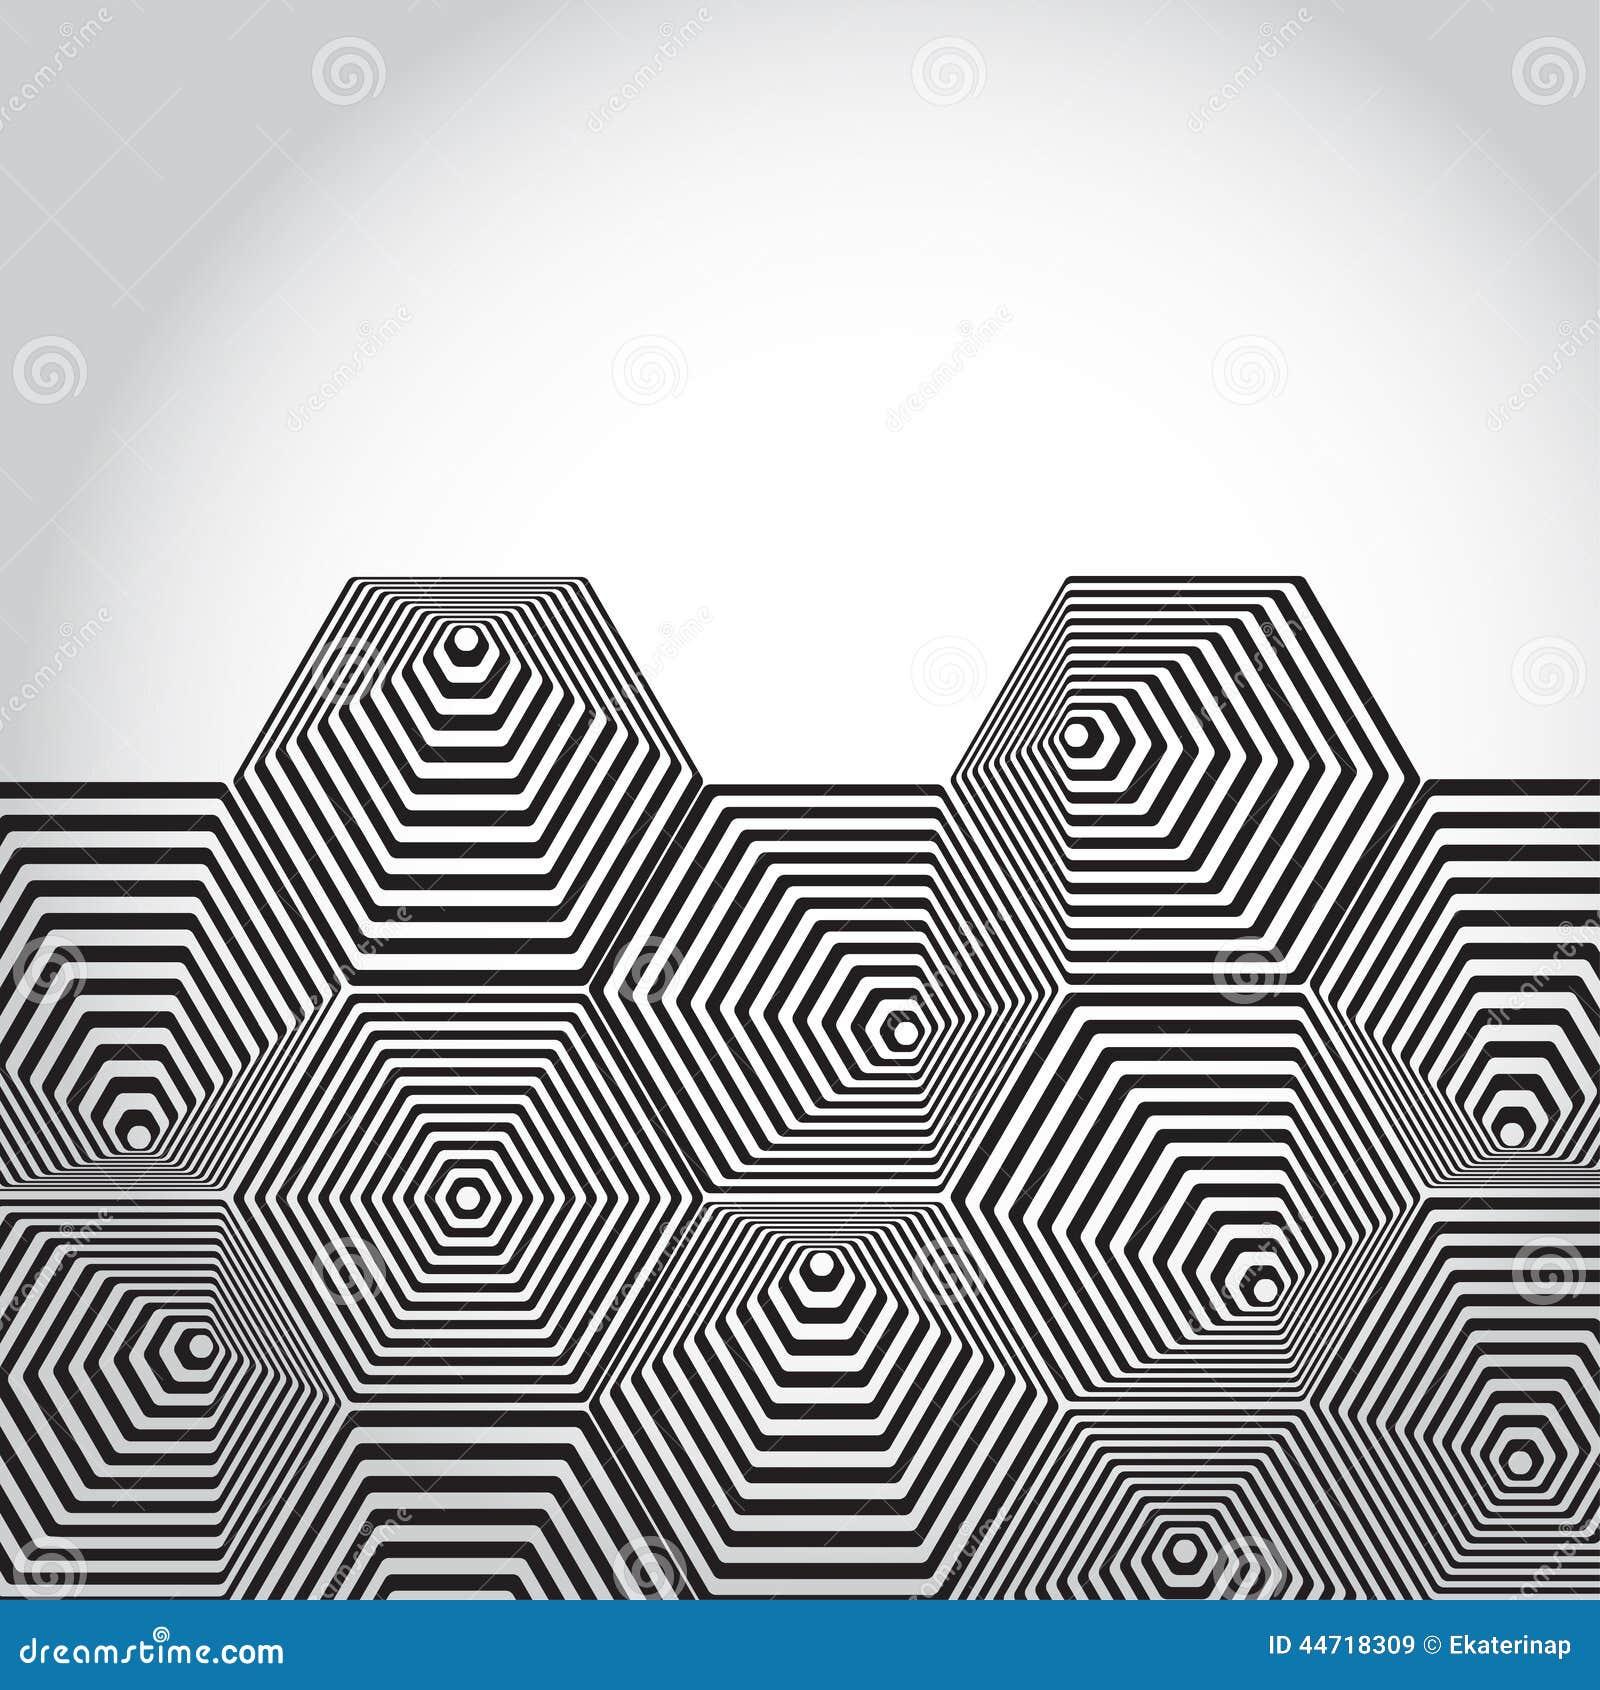 Volumetric 3d Pyramid Hexagon Optical Illusion